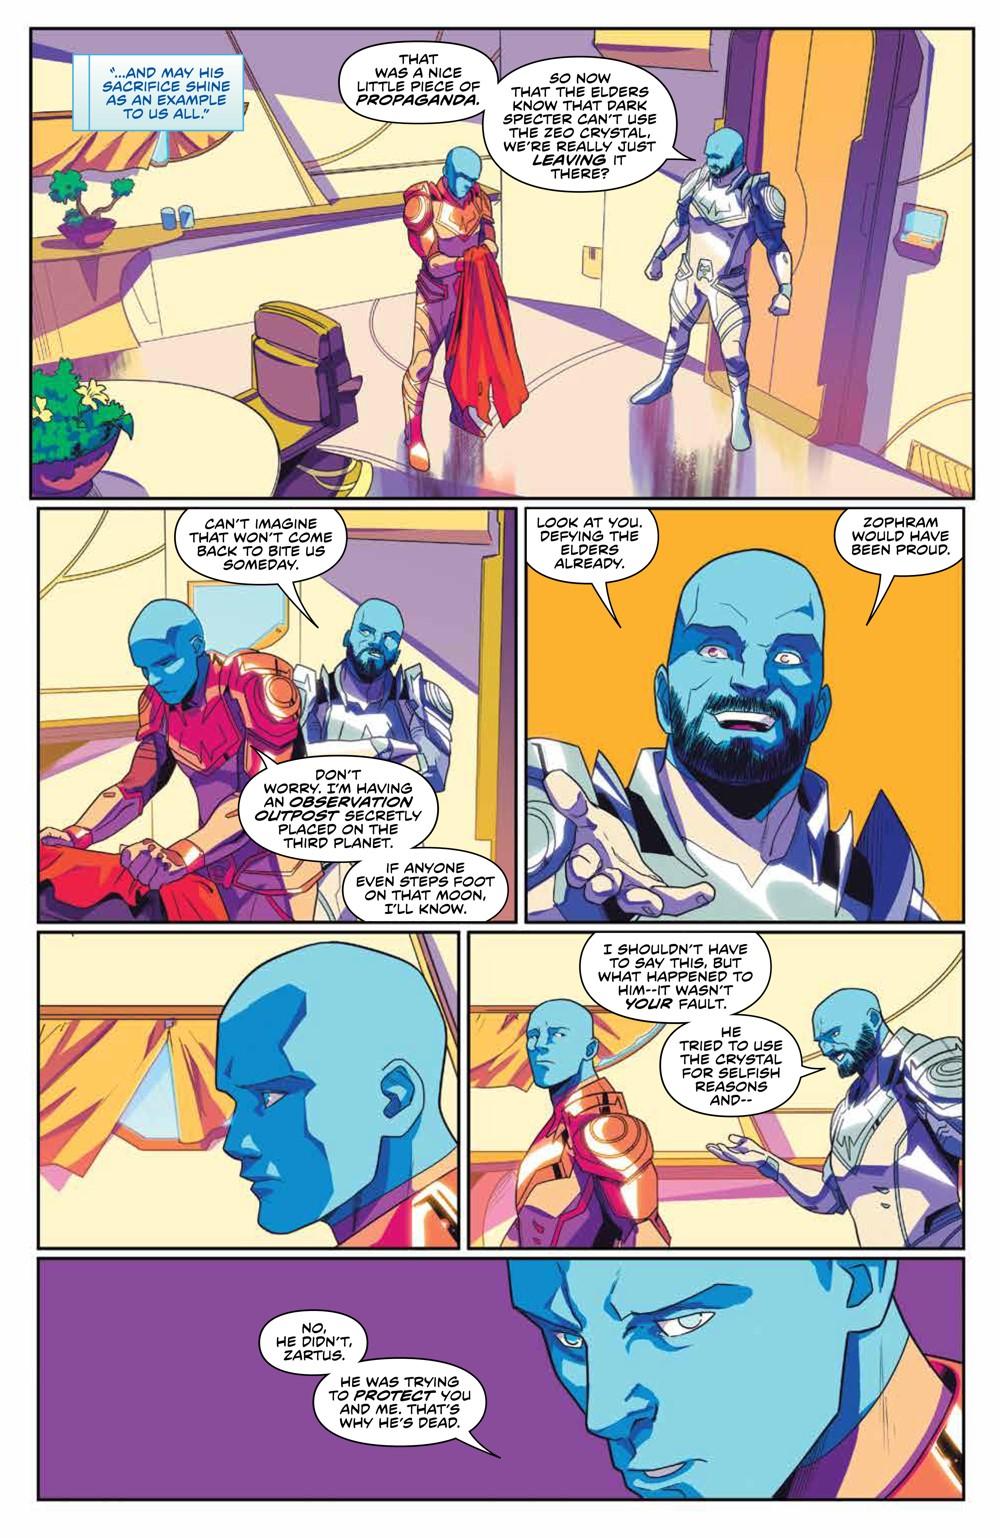 MightyMorphin_012_PRESS_4 ComicList Previews: MIGHTY MORPHIN #12